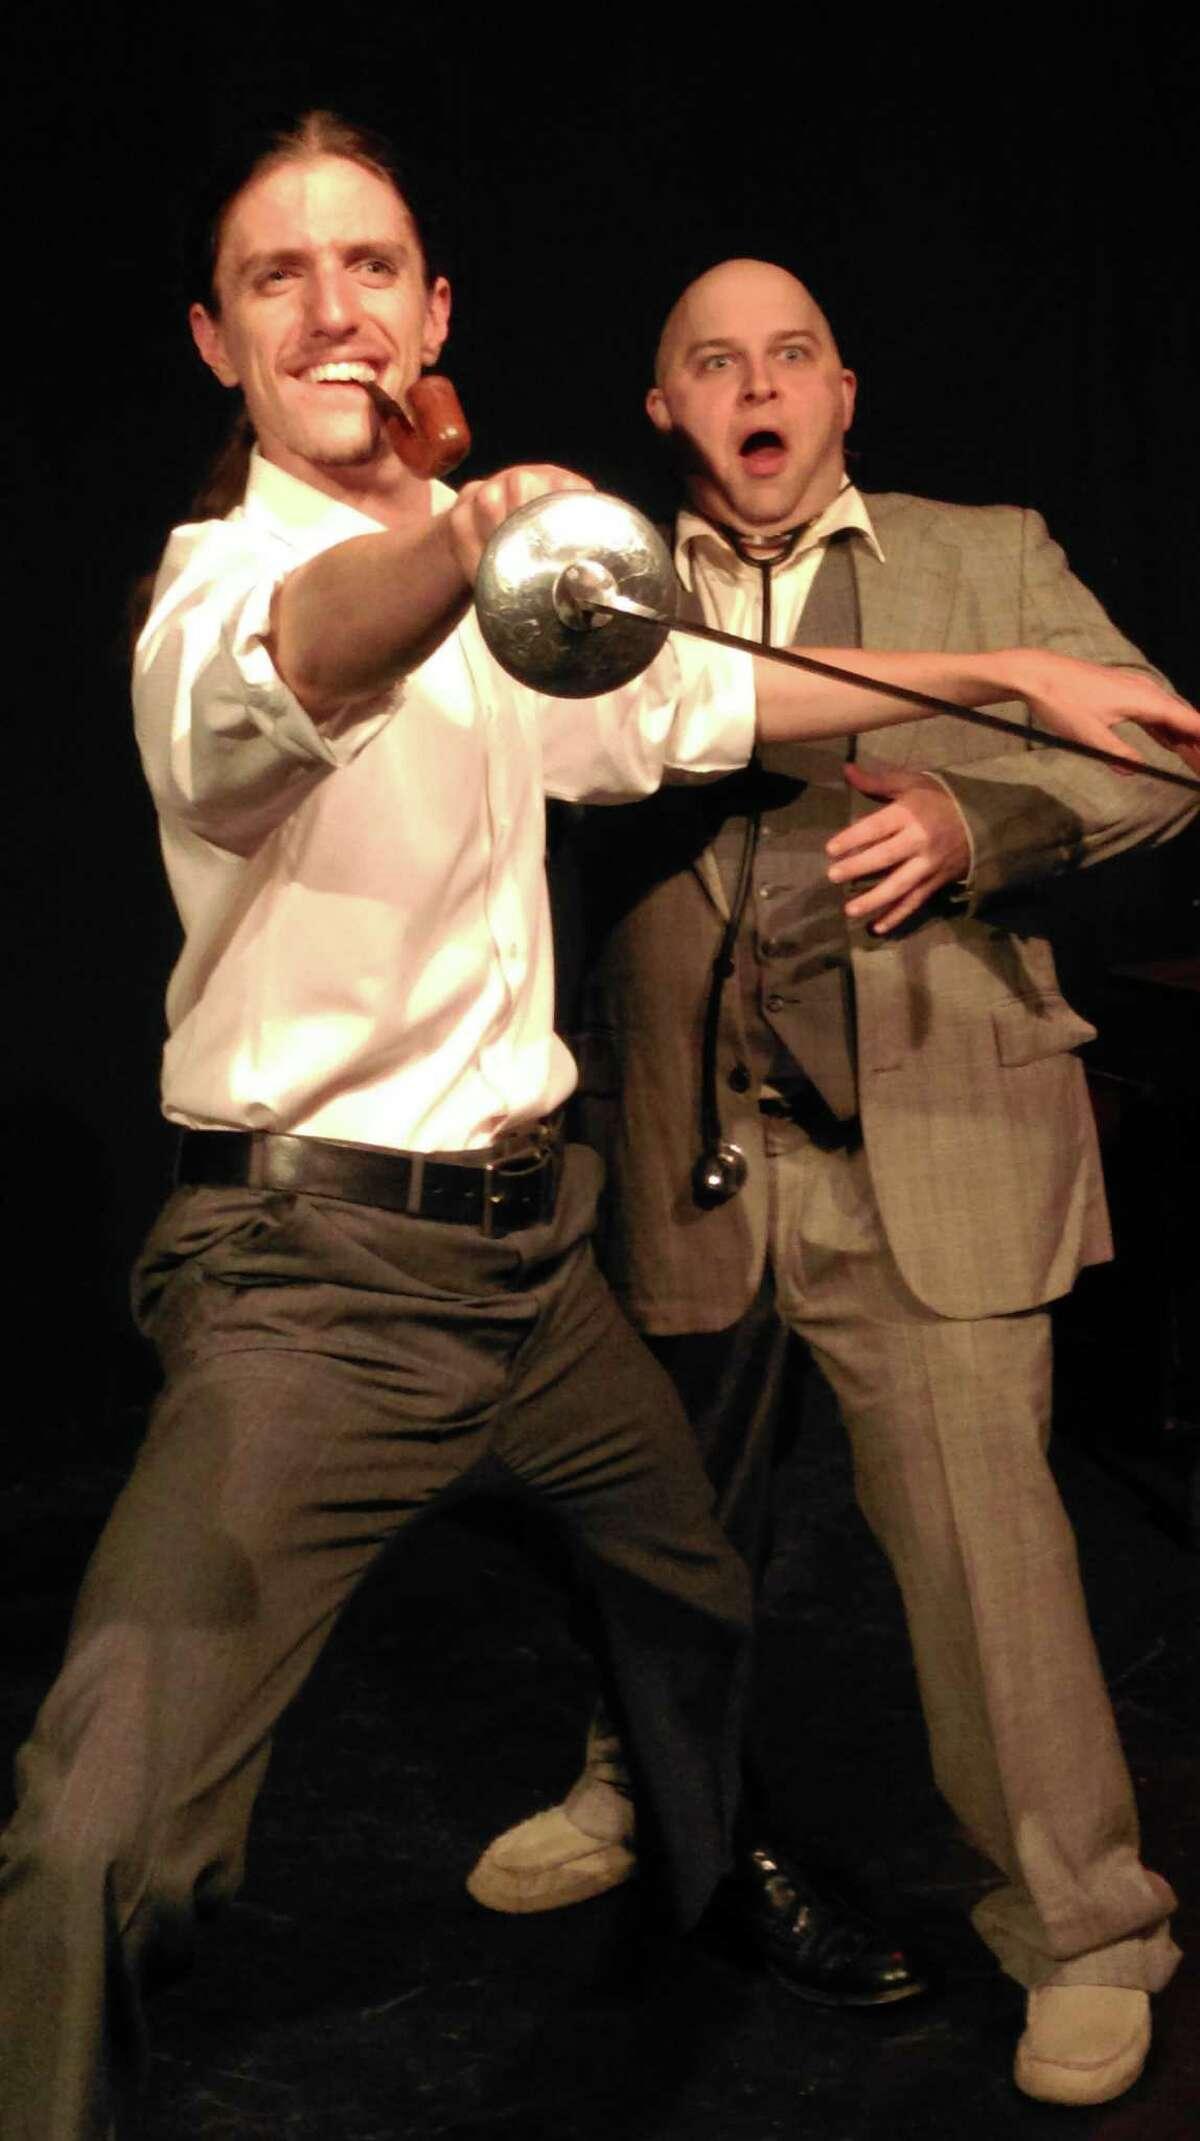 Joseph Travis Urick and Benjamin Scharff star in